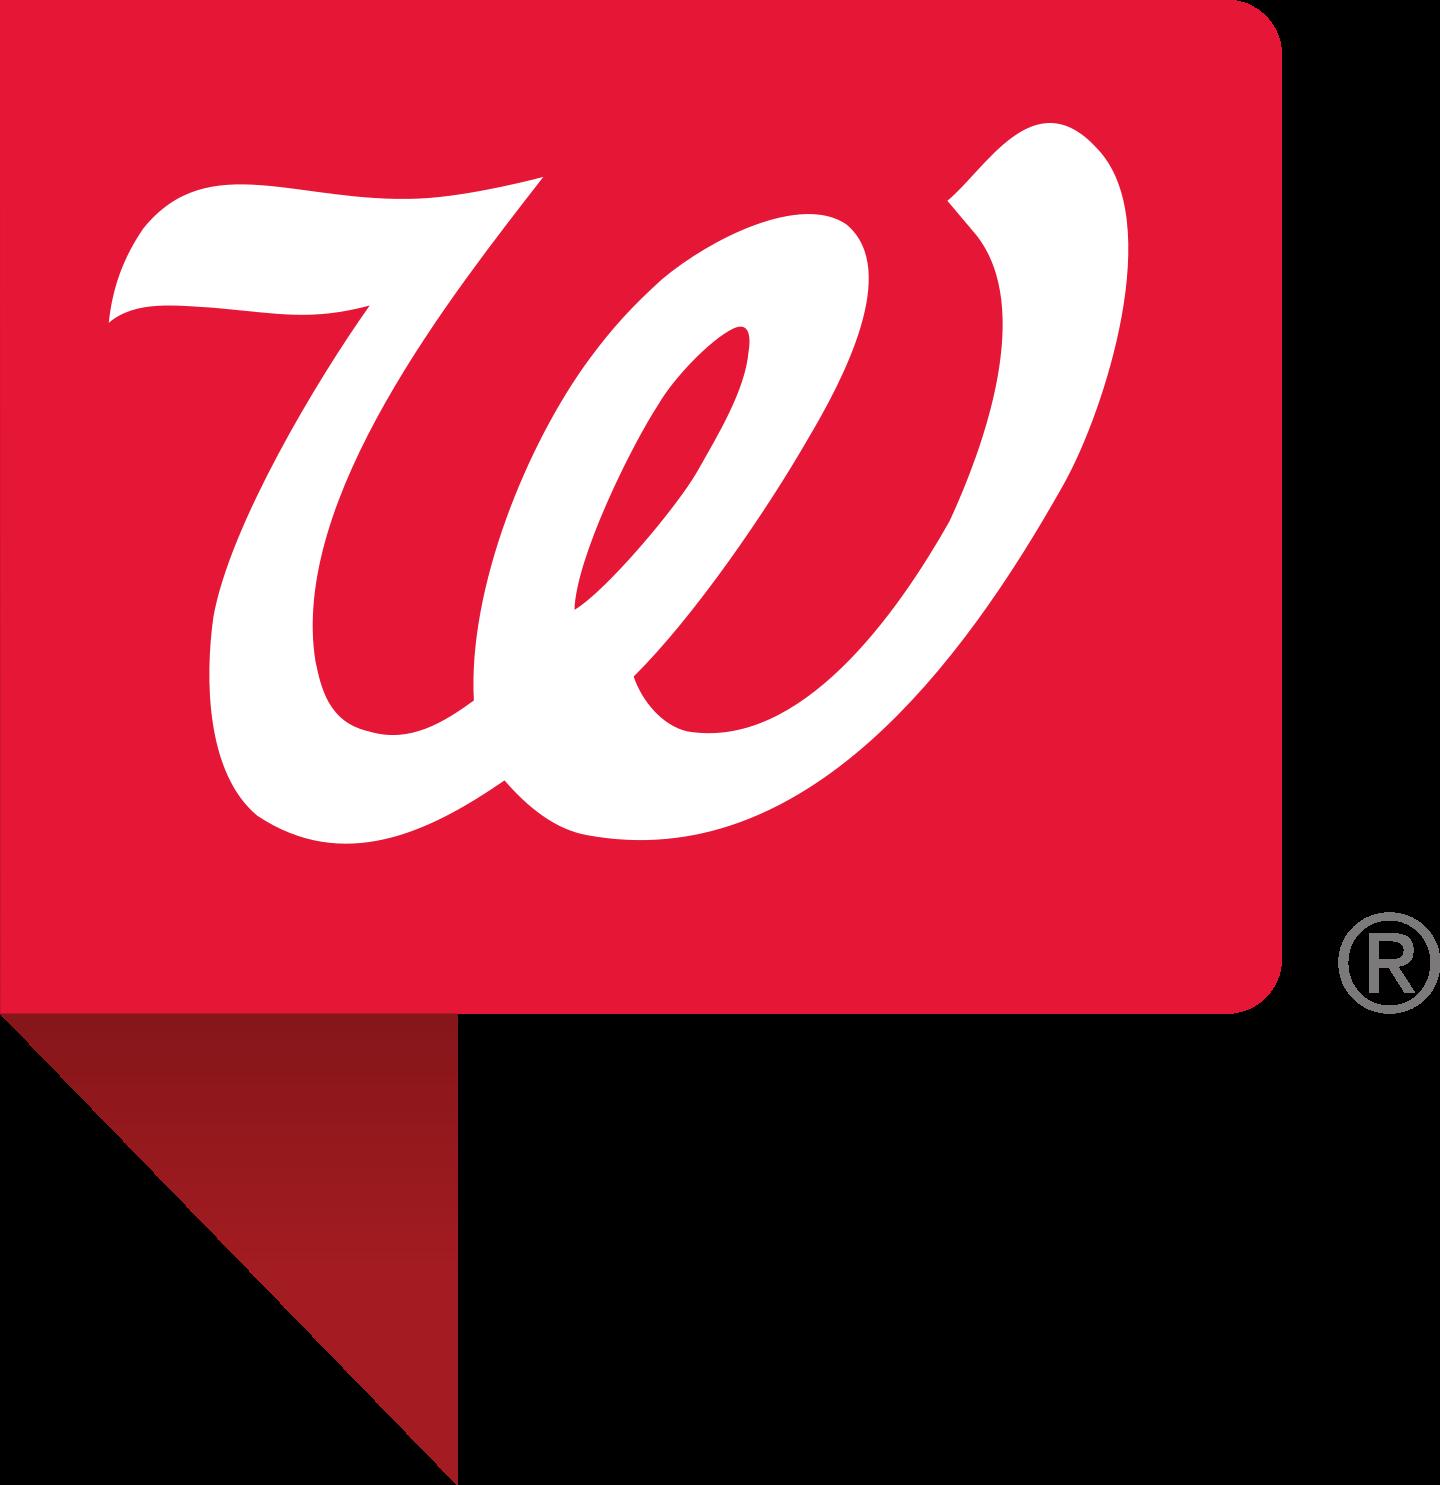 walgreens logo 3 - Walgreens Logo